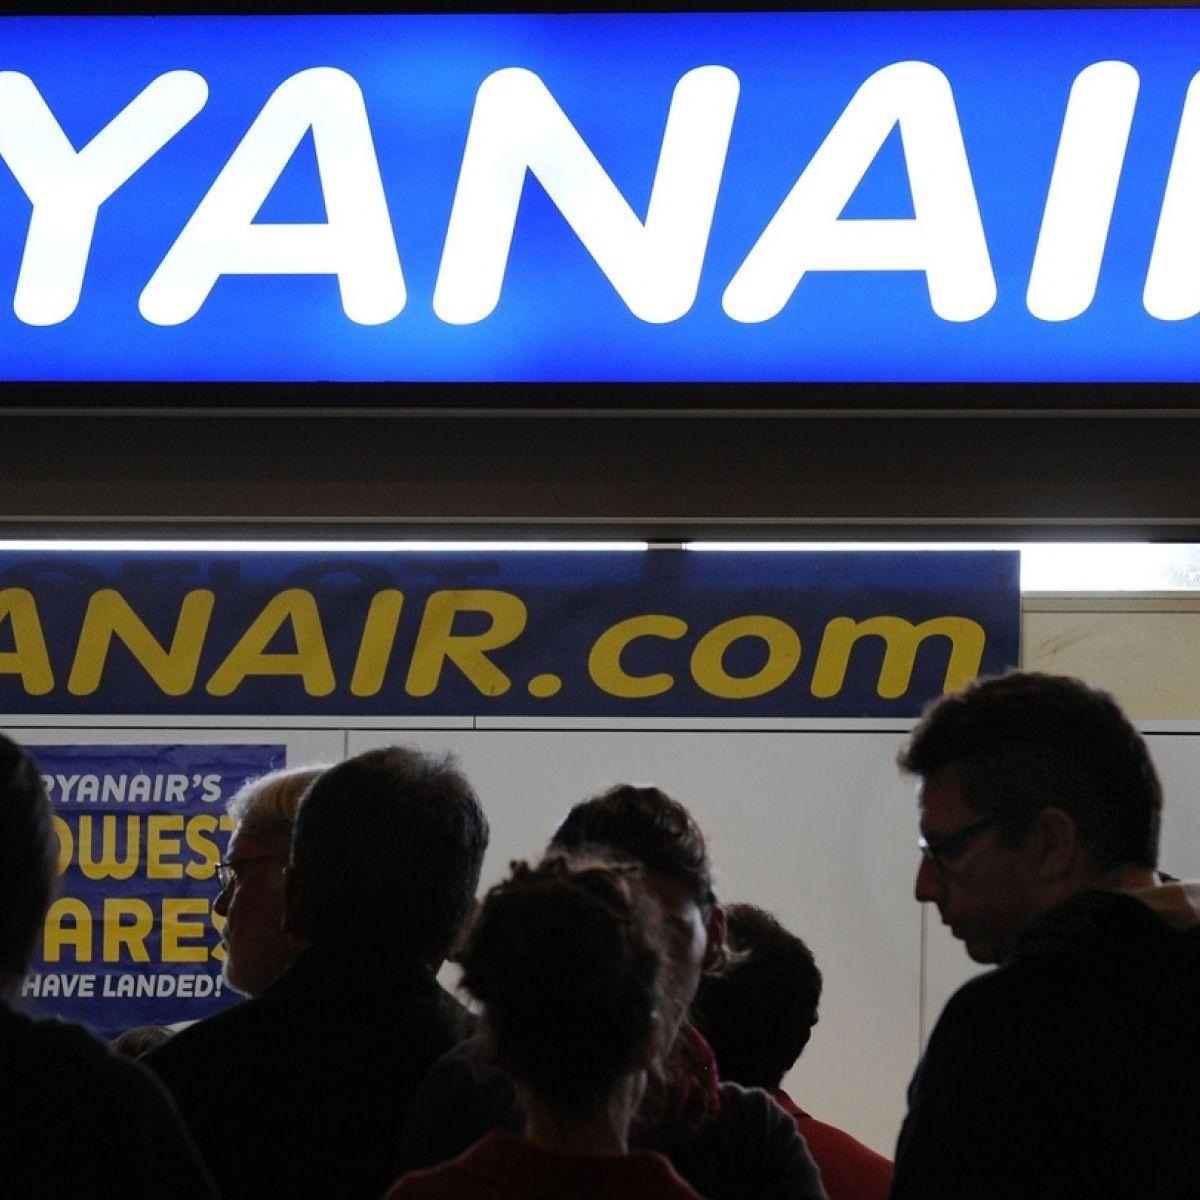 Ryanair's 'visa' stamp requirement leaves Americans in a